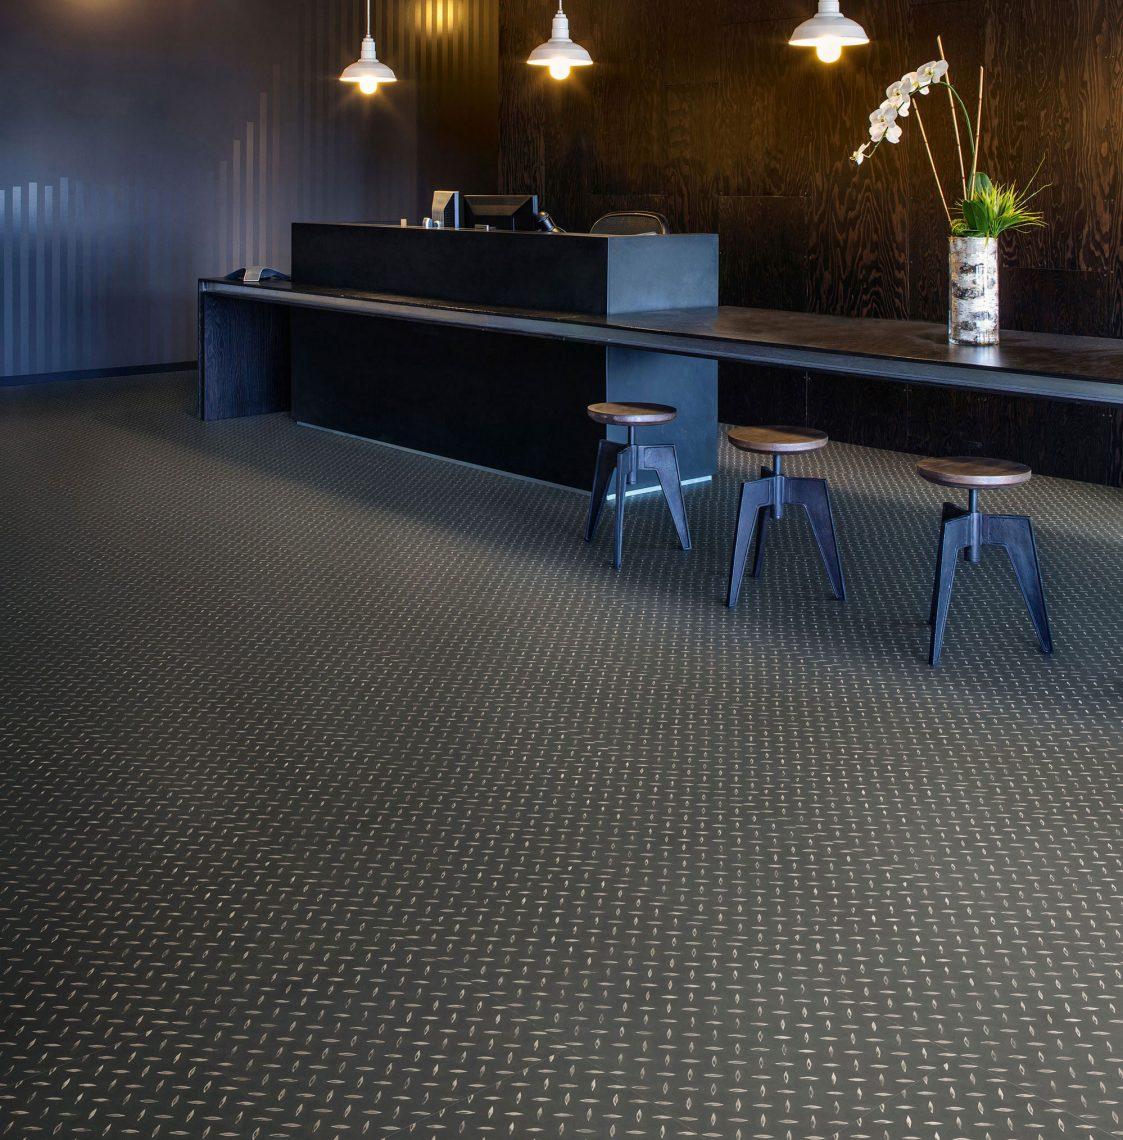 LVT Vinyl Tiles Polyflor Black Treadplate Reception Desk